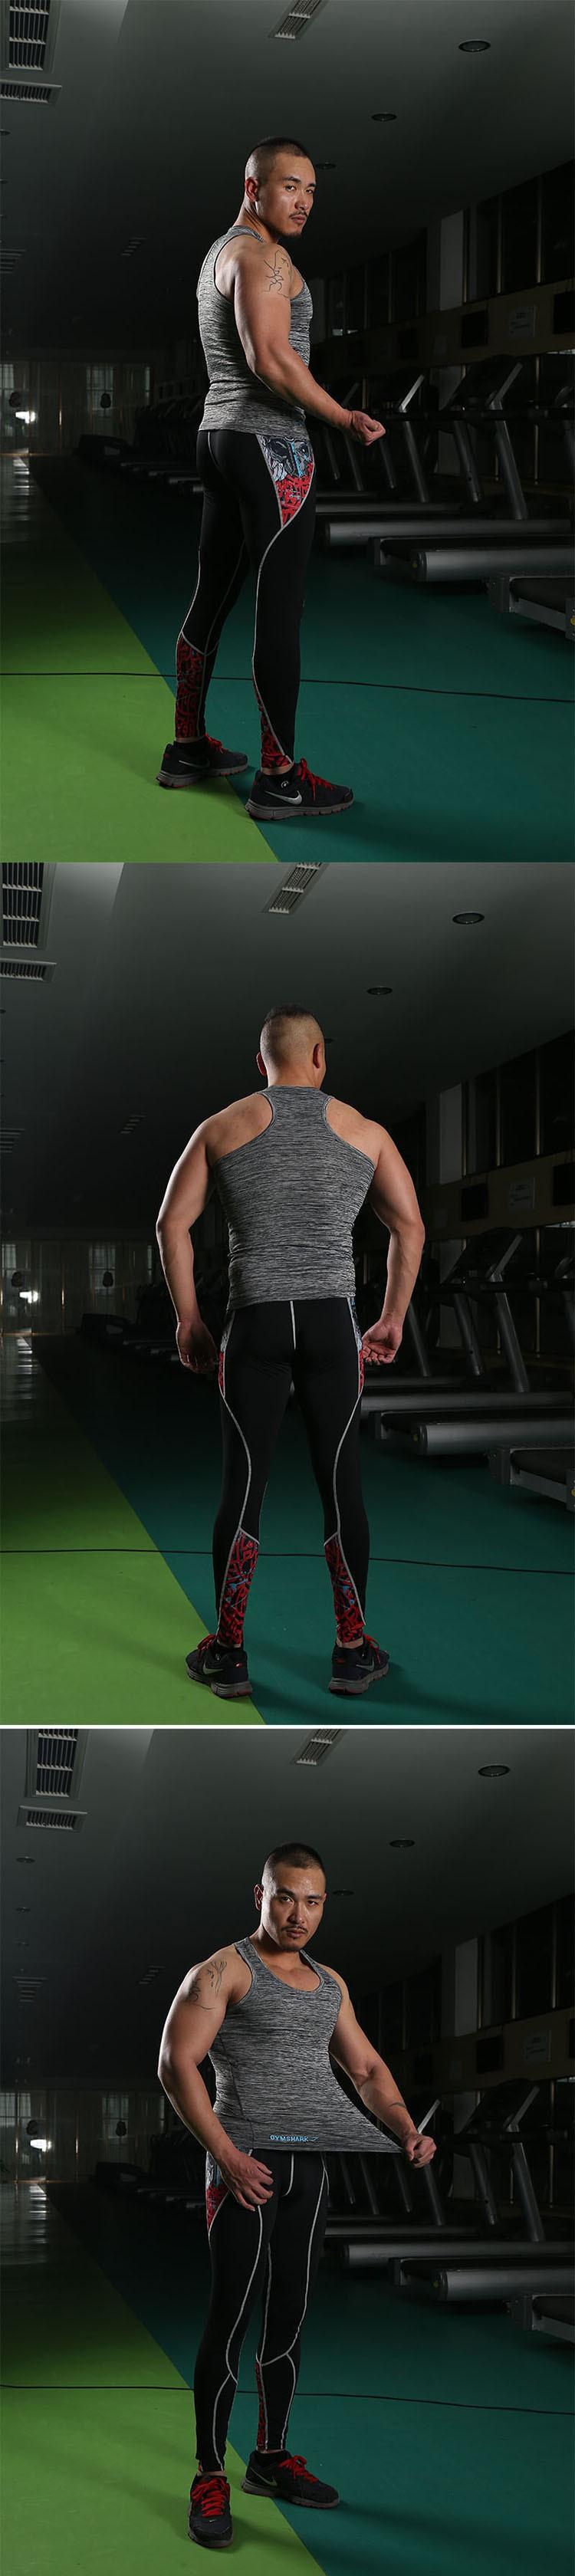 Gym Tank Tops Men Undershirt Sports Wear GymShark Singlet Bodybuilding Basketball Fitness Training Tight Vest Sleeveless Shirt (8)